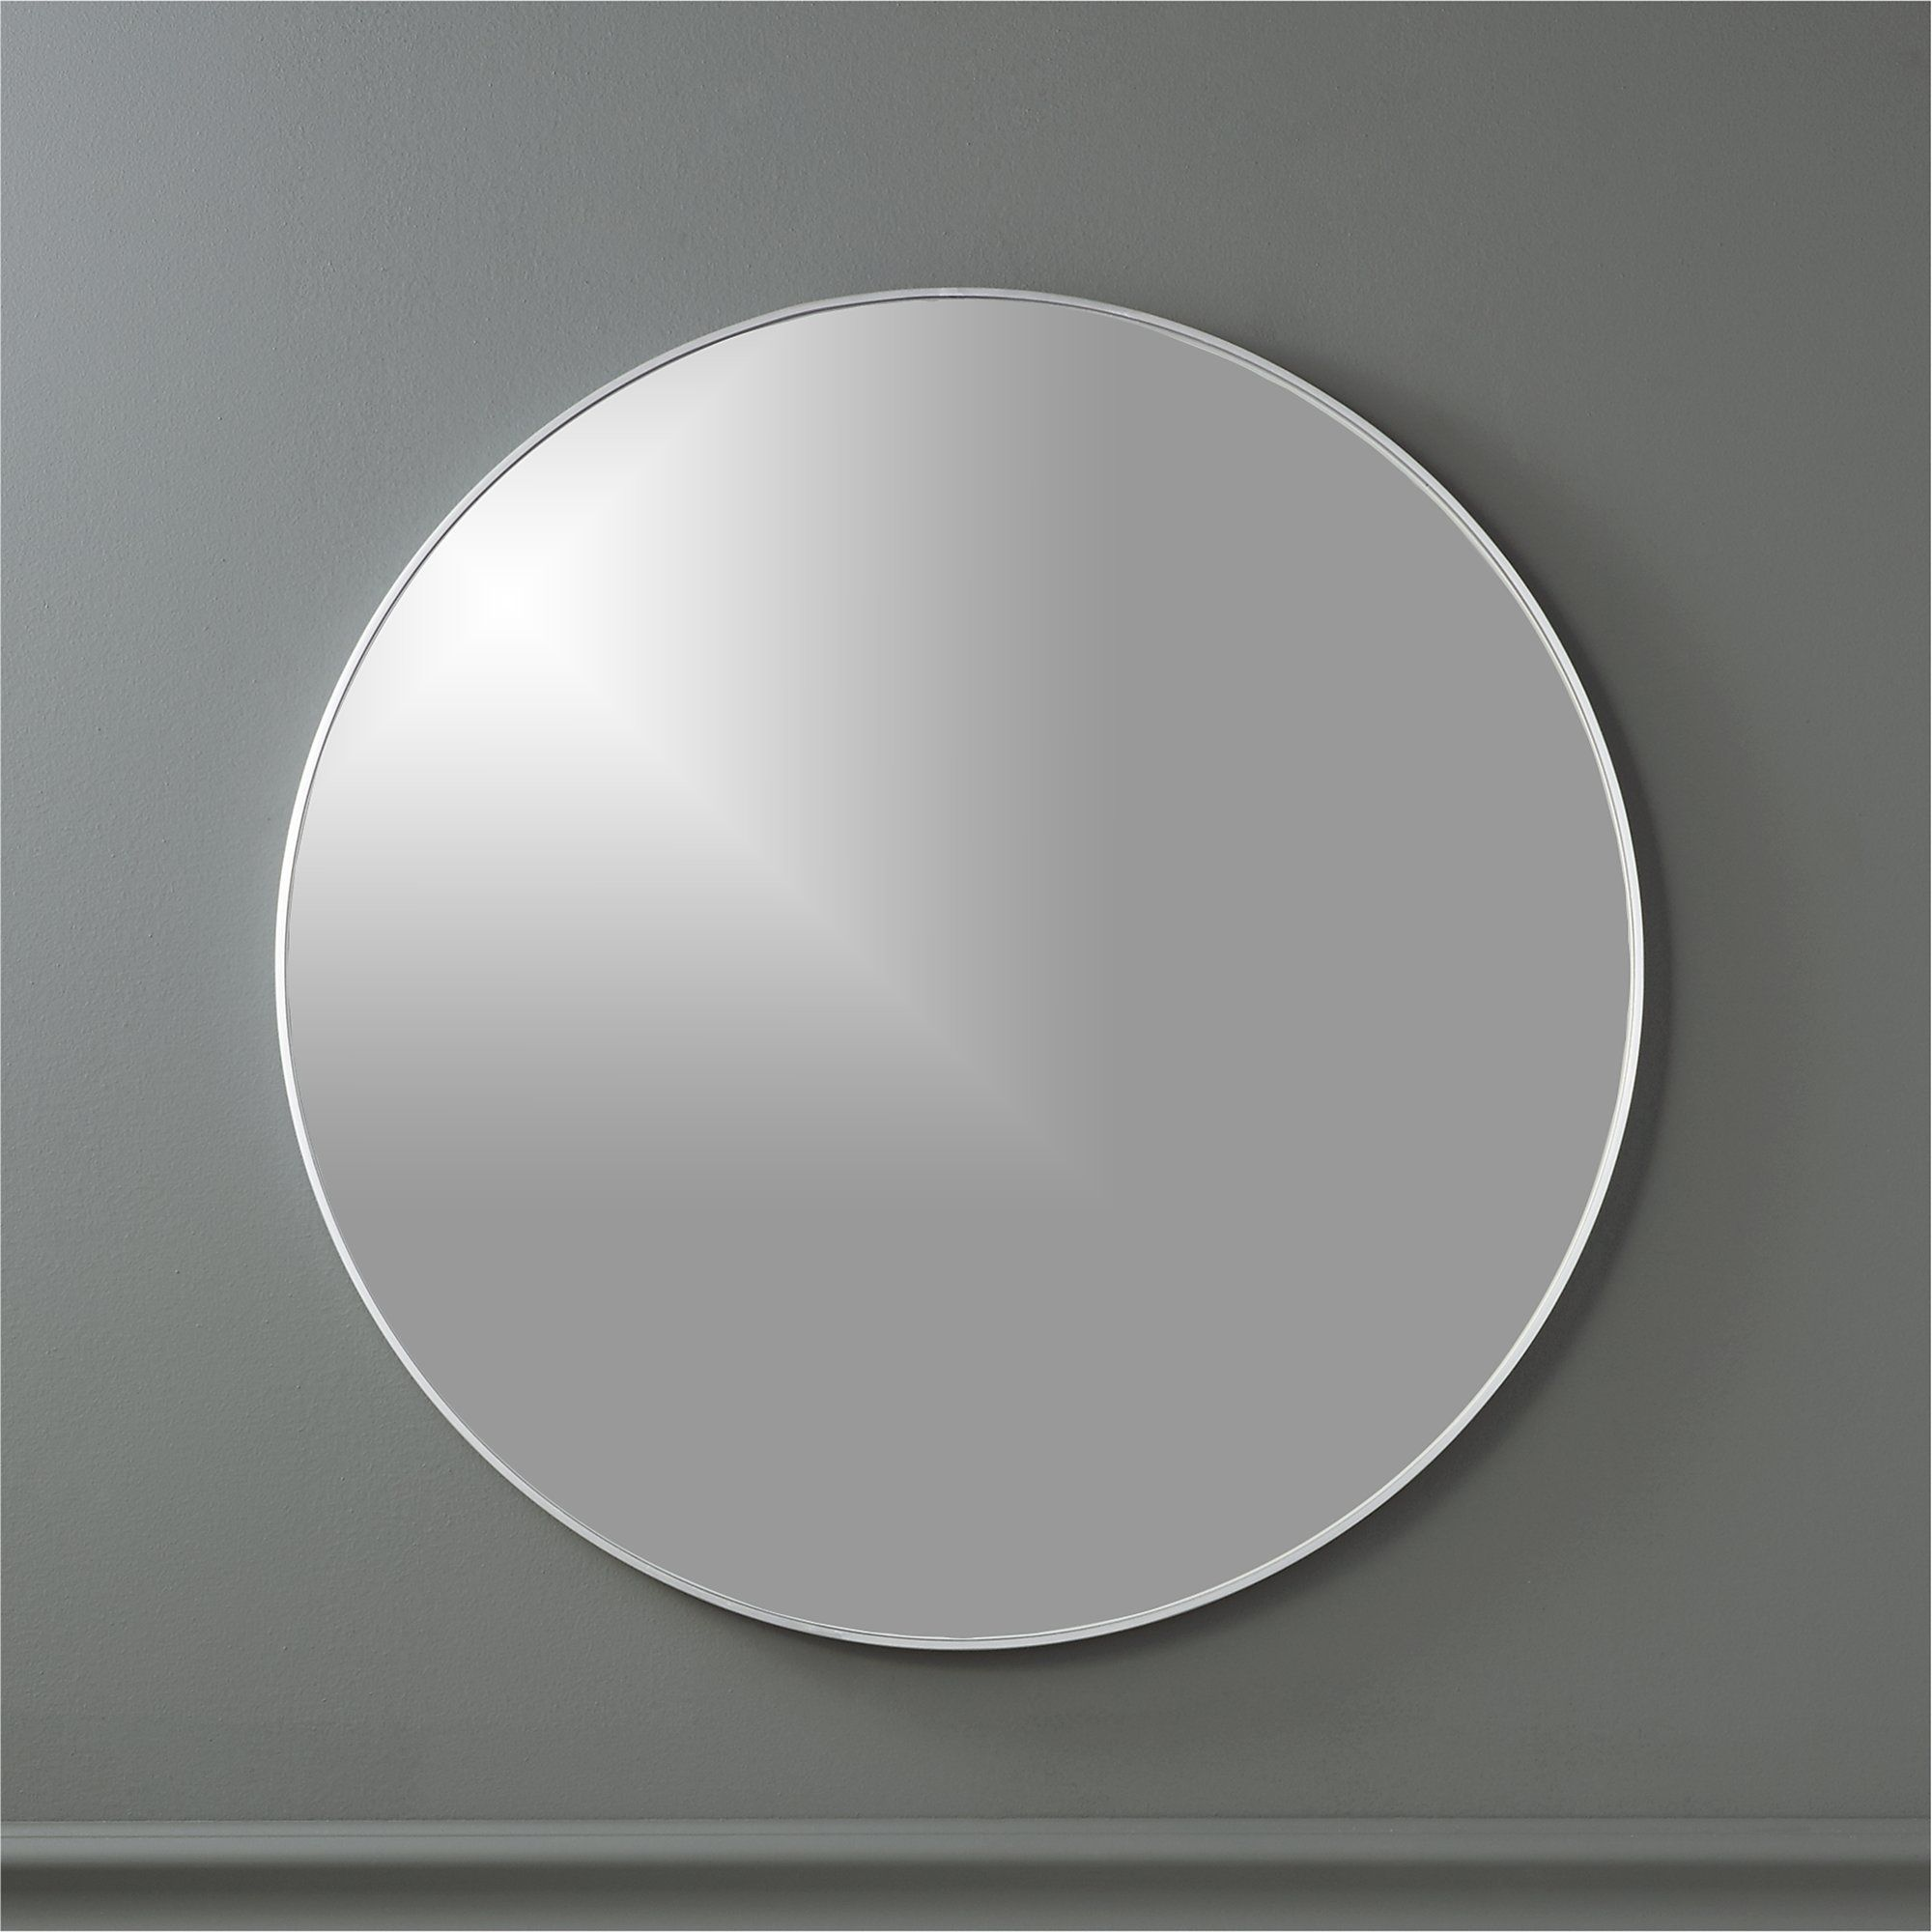 "Infinity Black Round Wall Mirror 24"" + Reviews CB2"